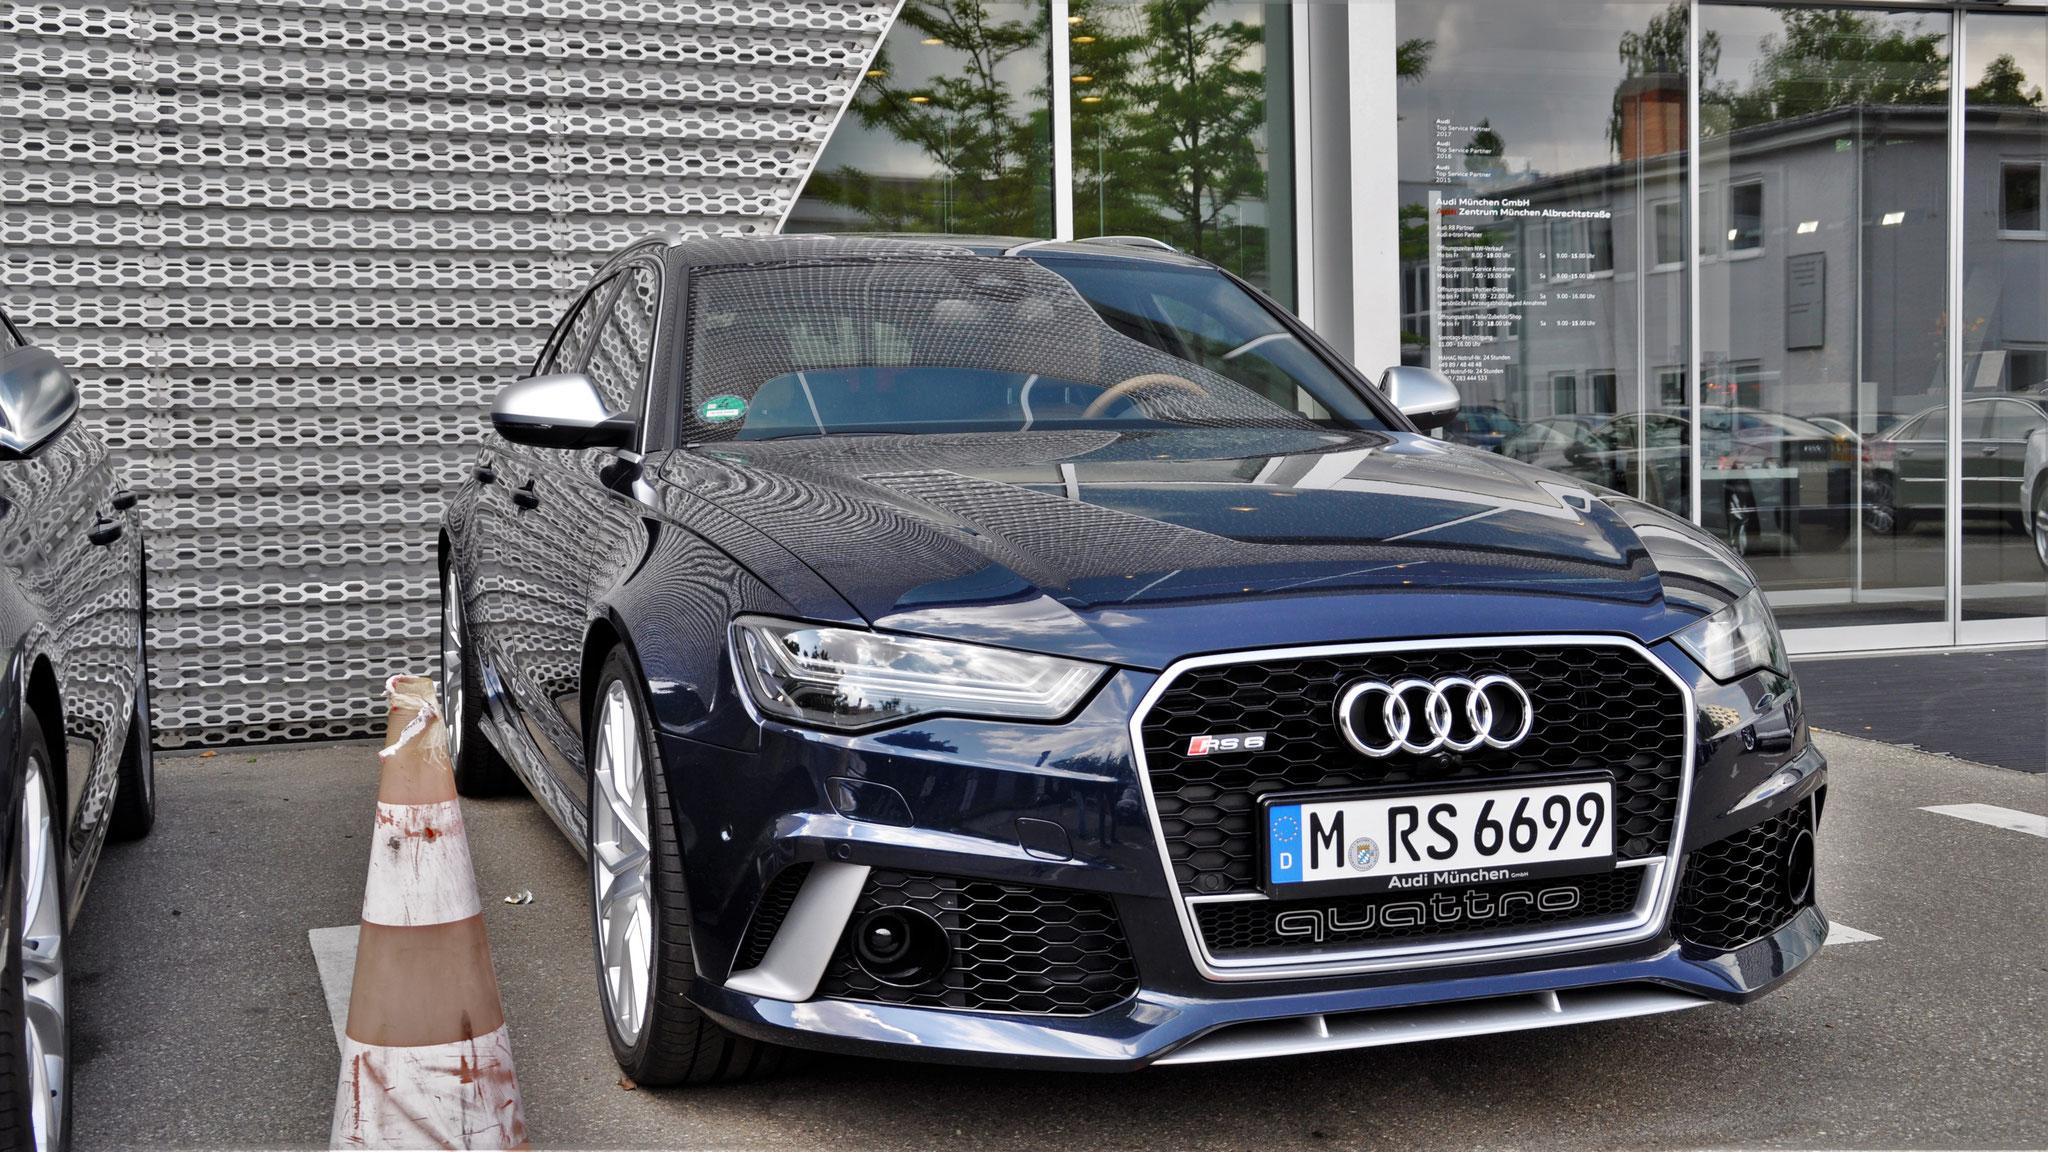 Audi RS6 - M-RS-6699